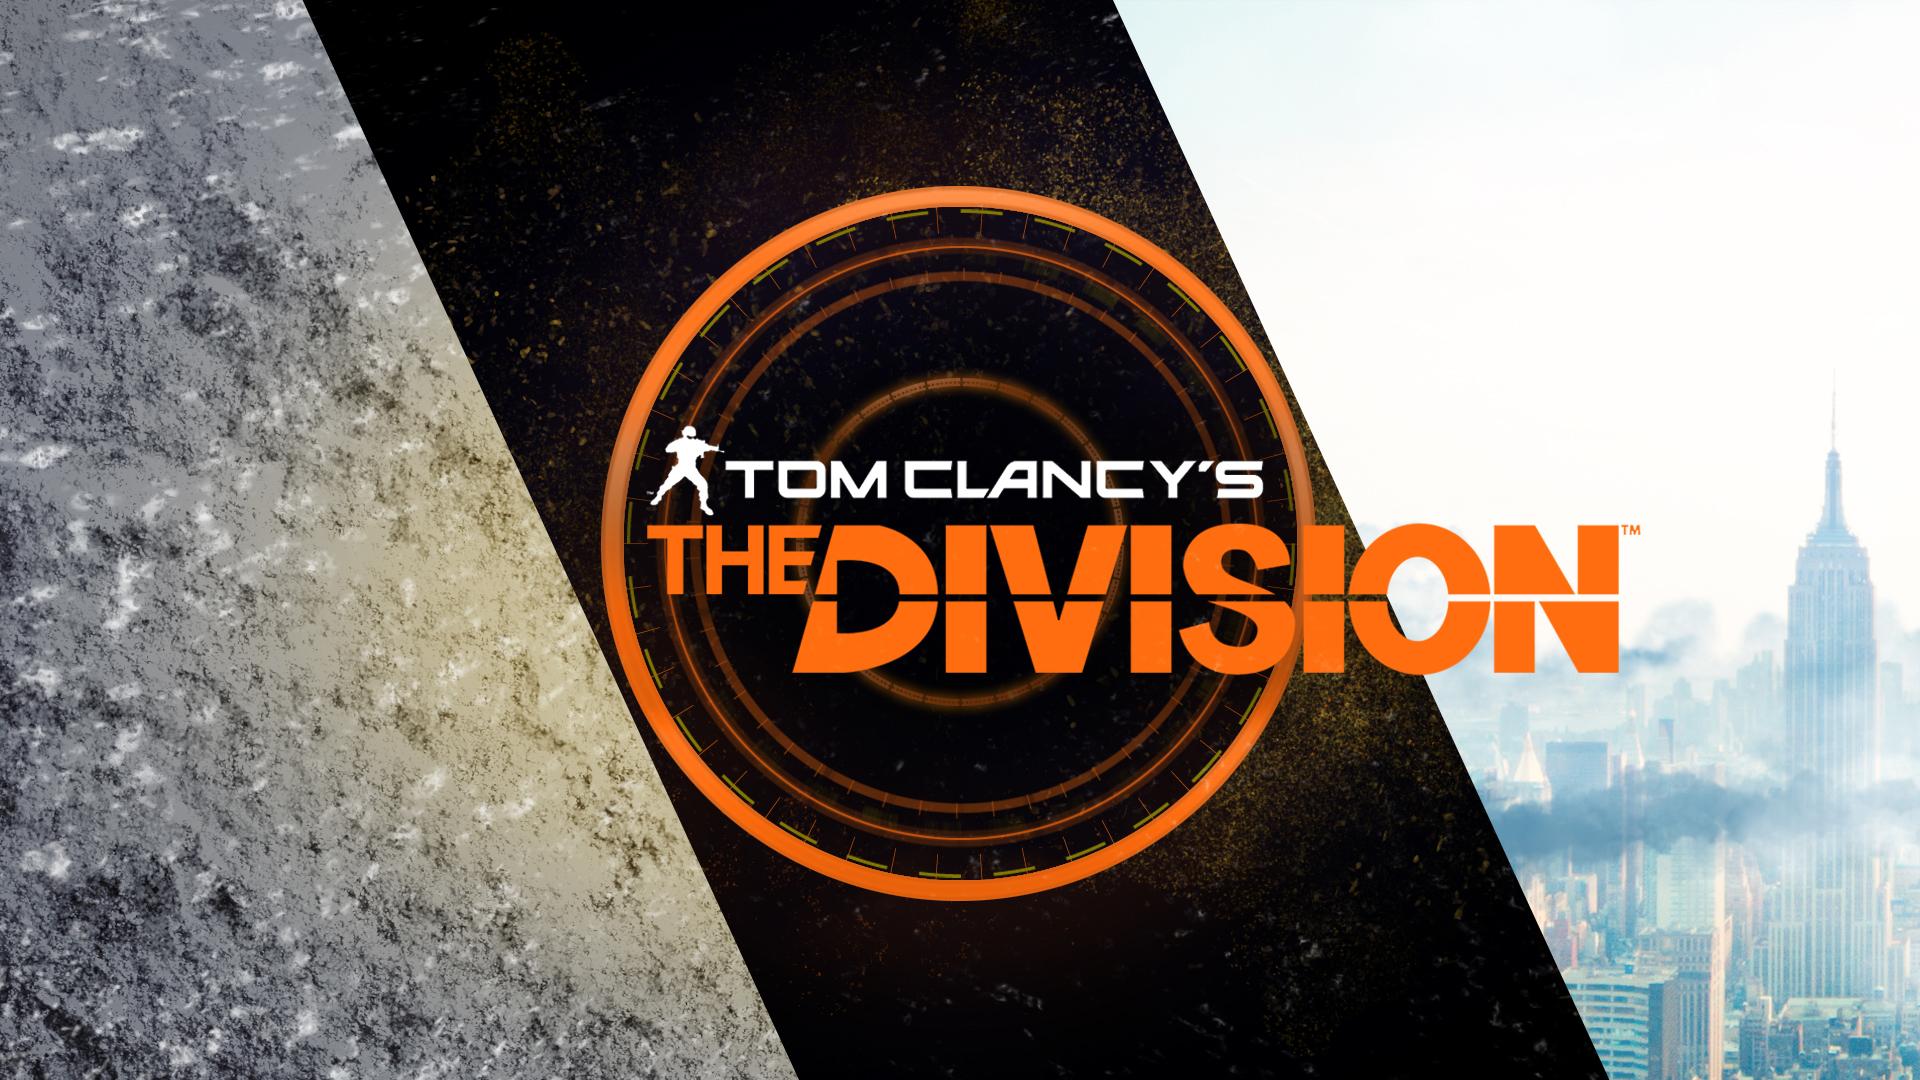 Imagini pentru The division phoenix wallpaper